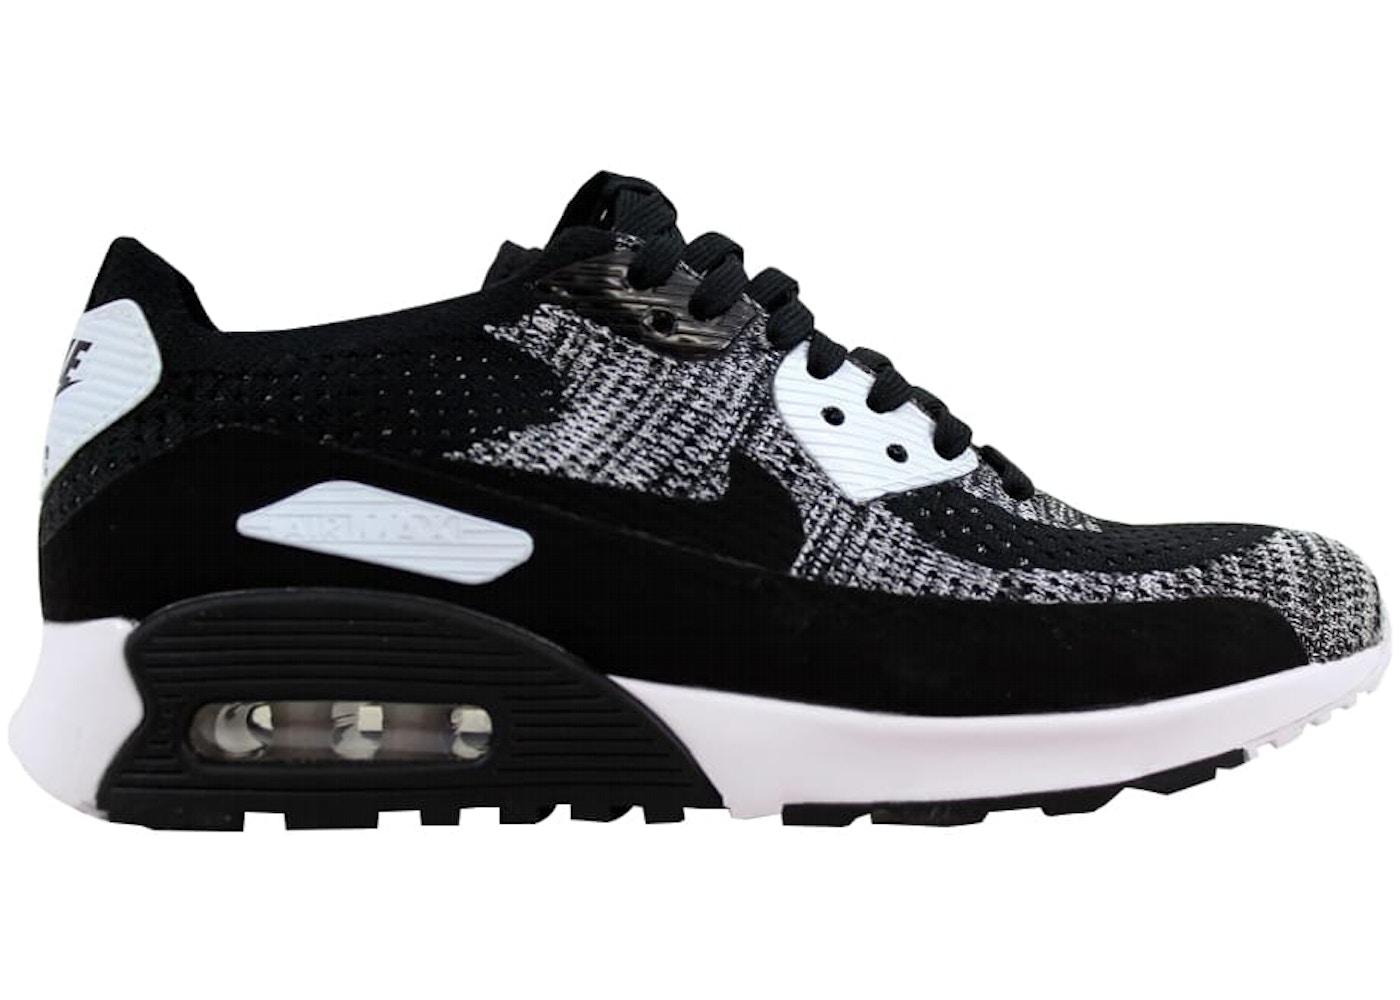 15297b8e69909 Nike Shoes - New Highest Bids